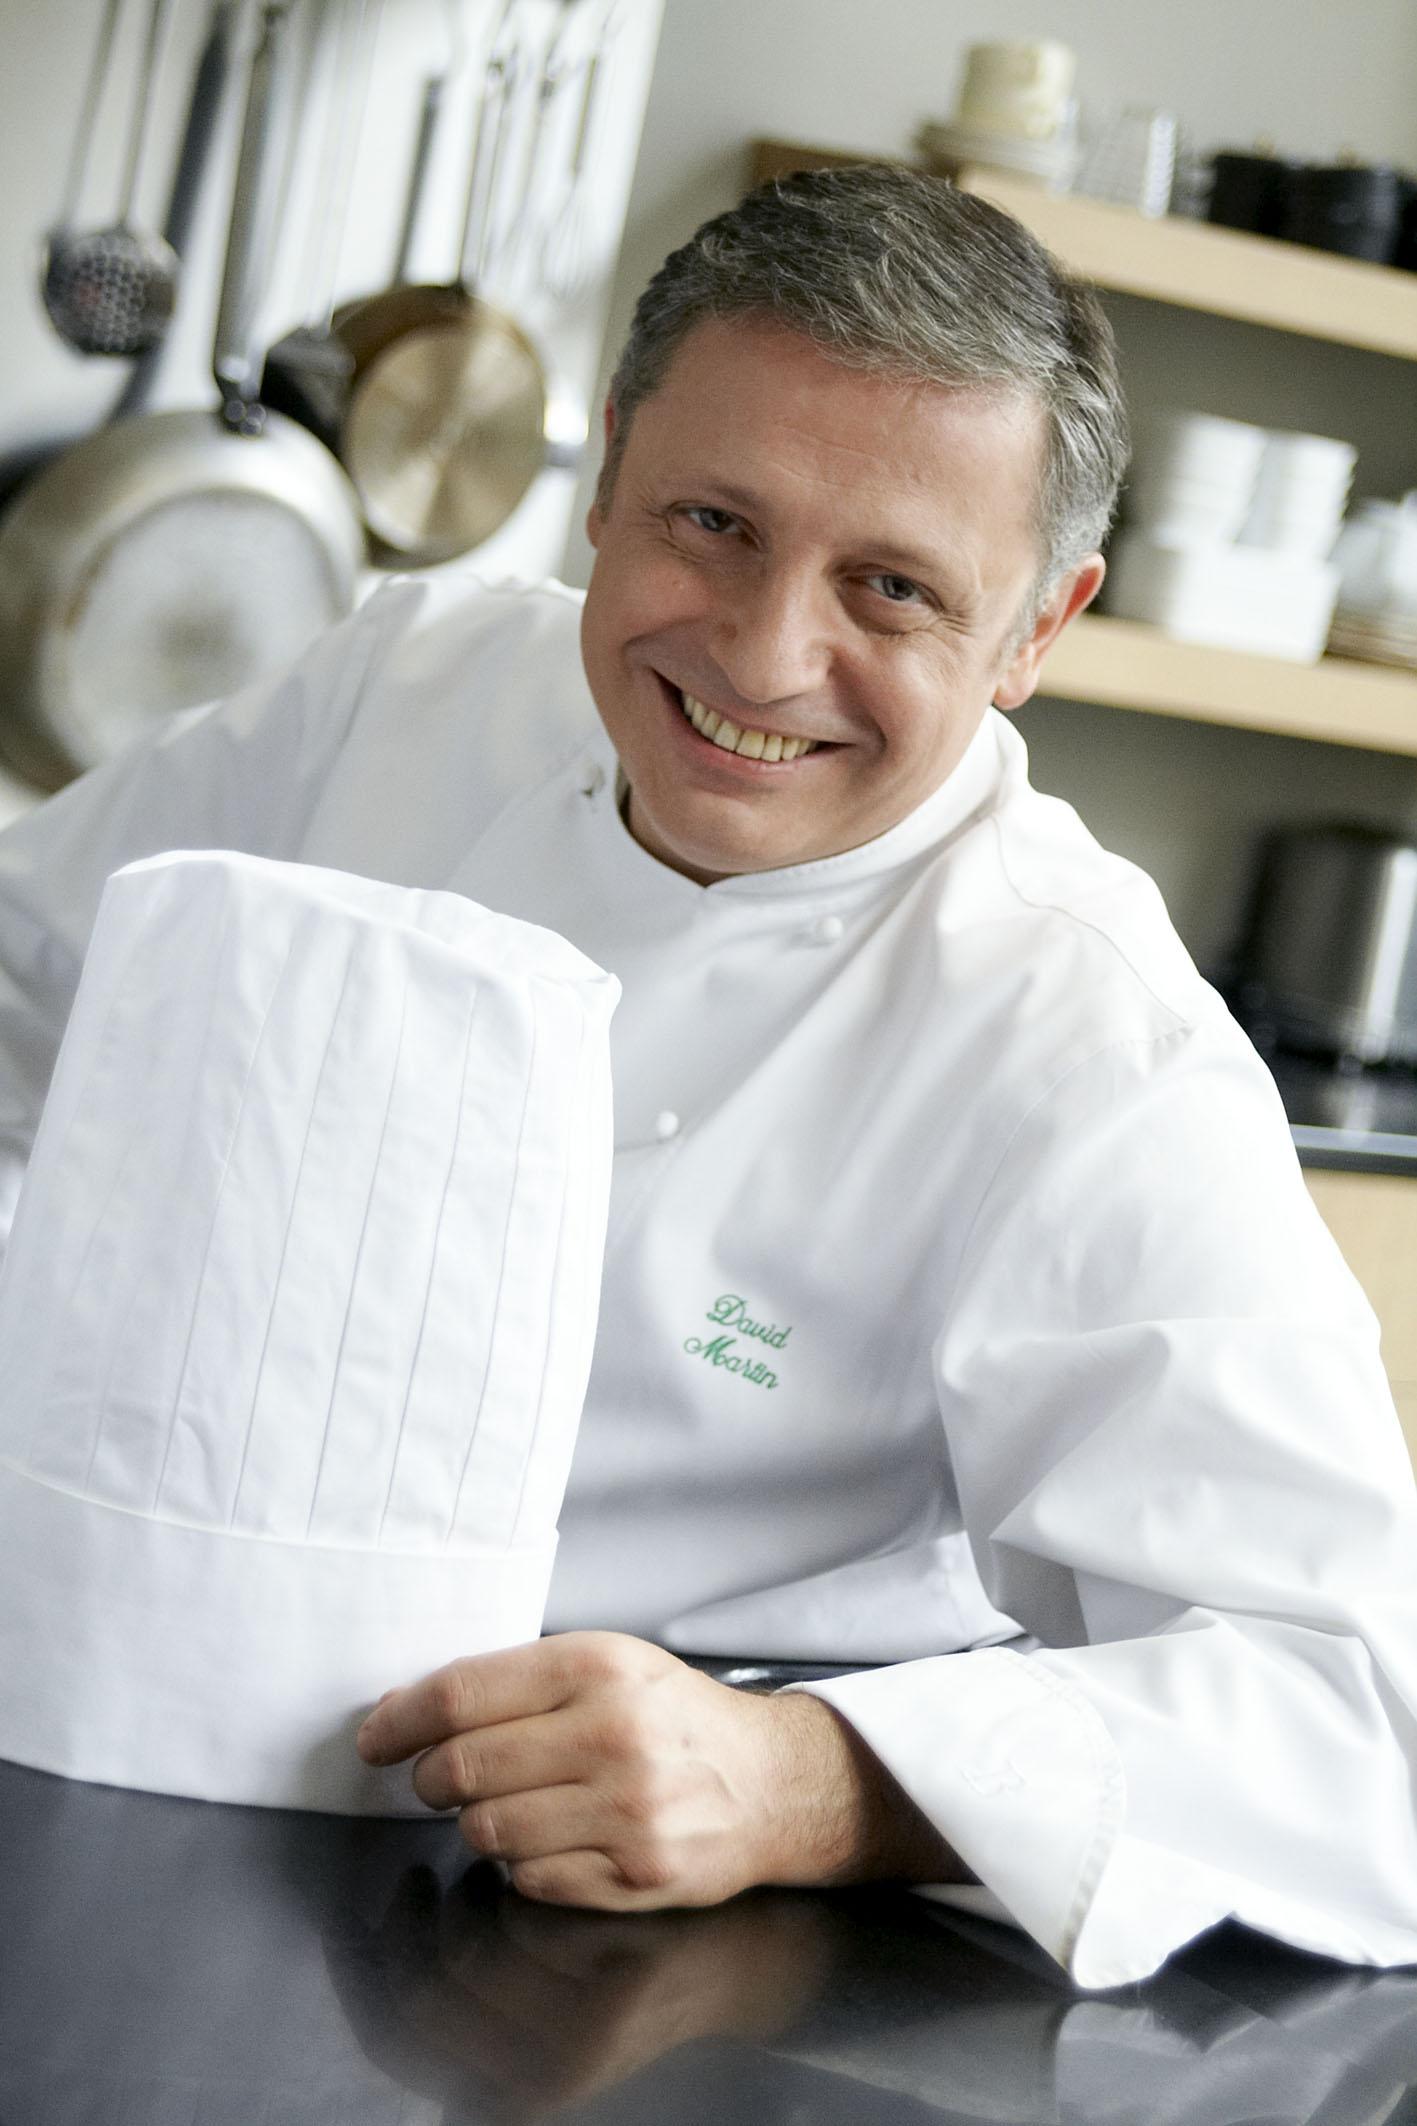 Chef Cuisinier Restaurant Peter S Passage Mir Ef Bf Bds Lion Ours